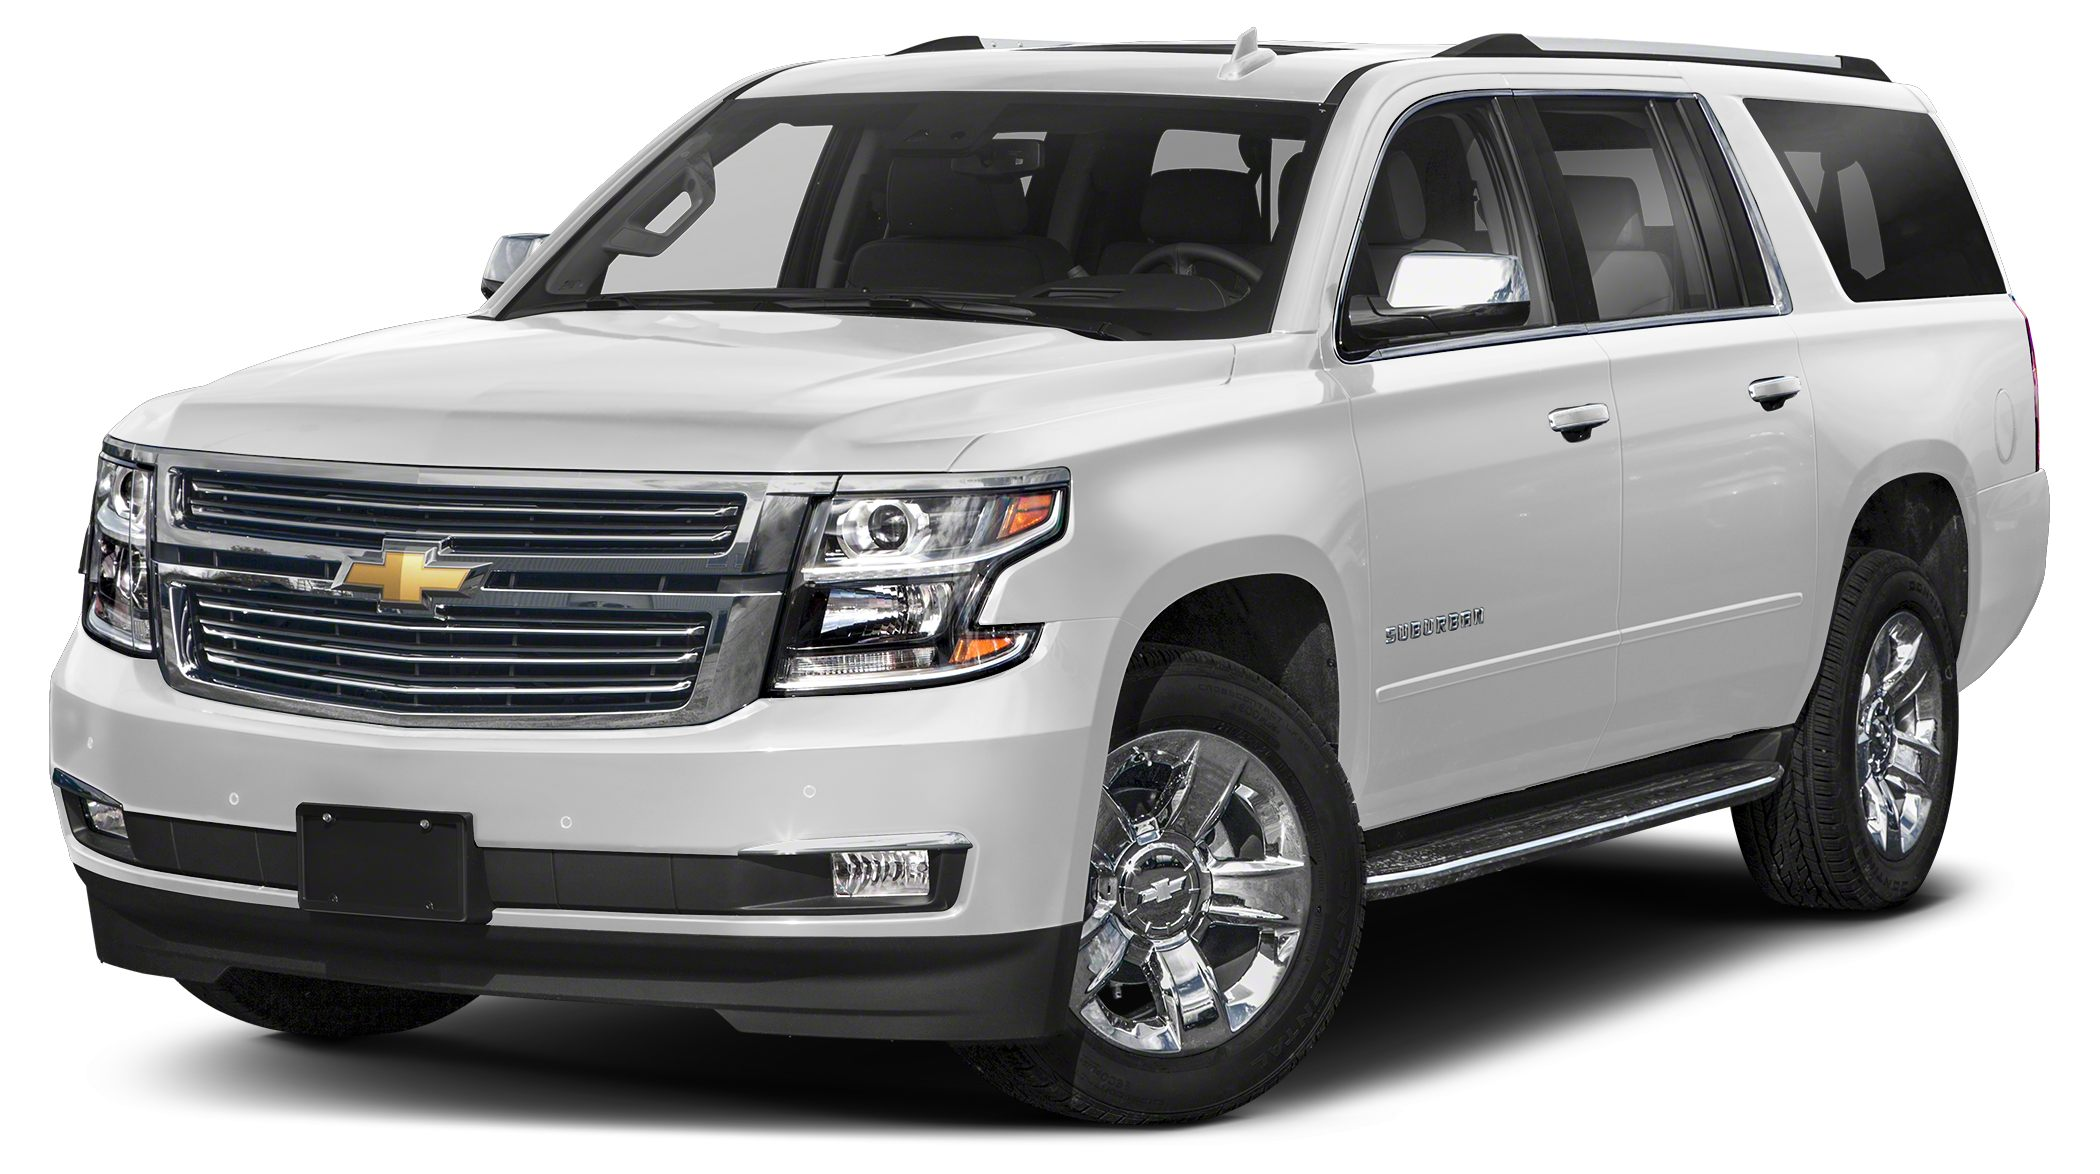 2018 Chevrolet Suburban Premier What happens when you combine the utility of a truck versatility